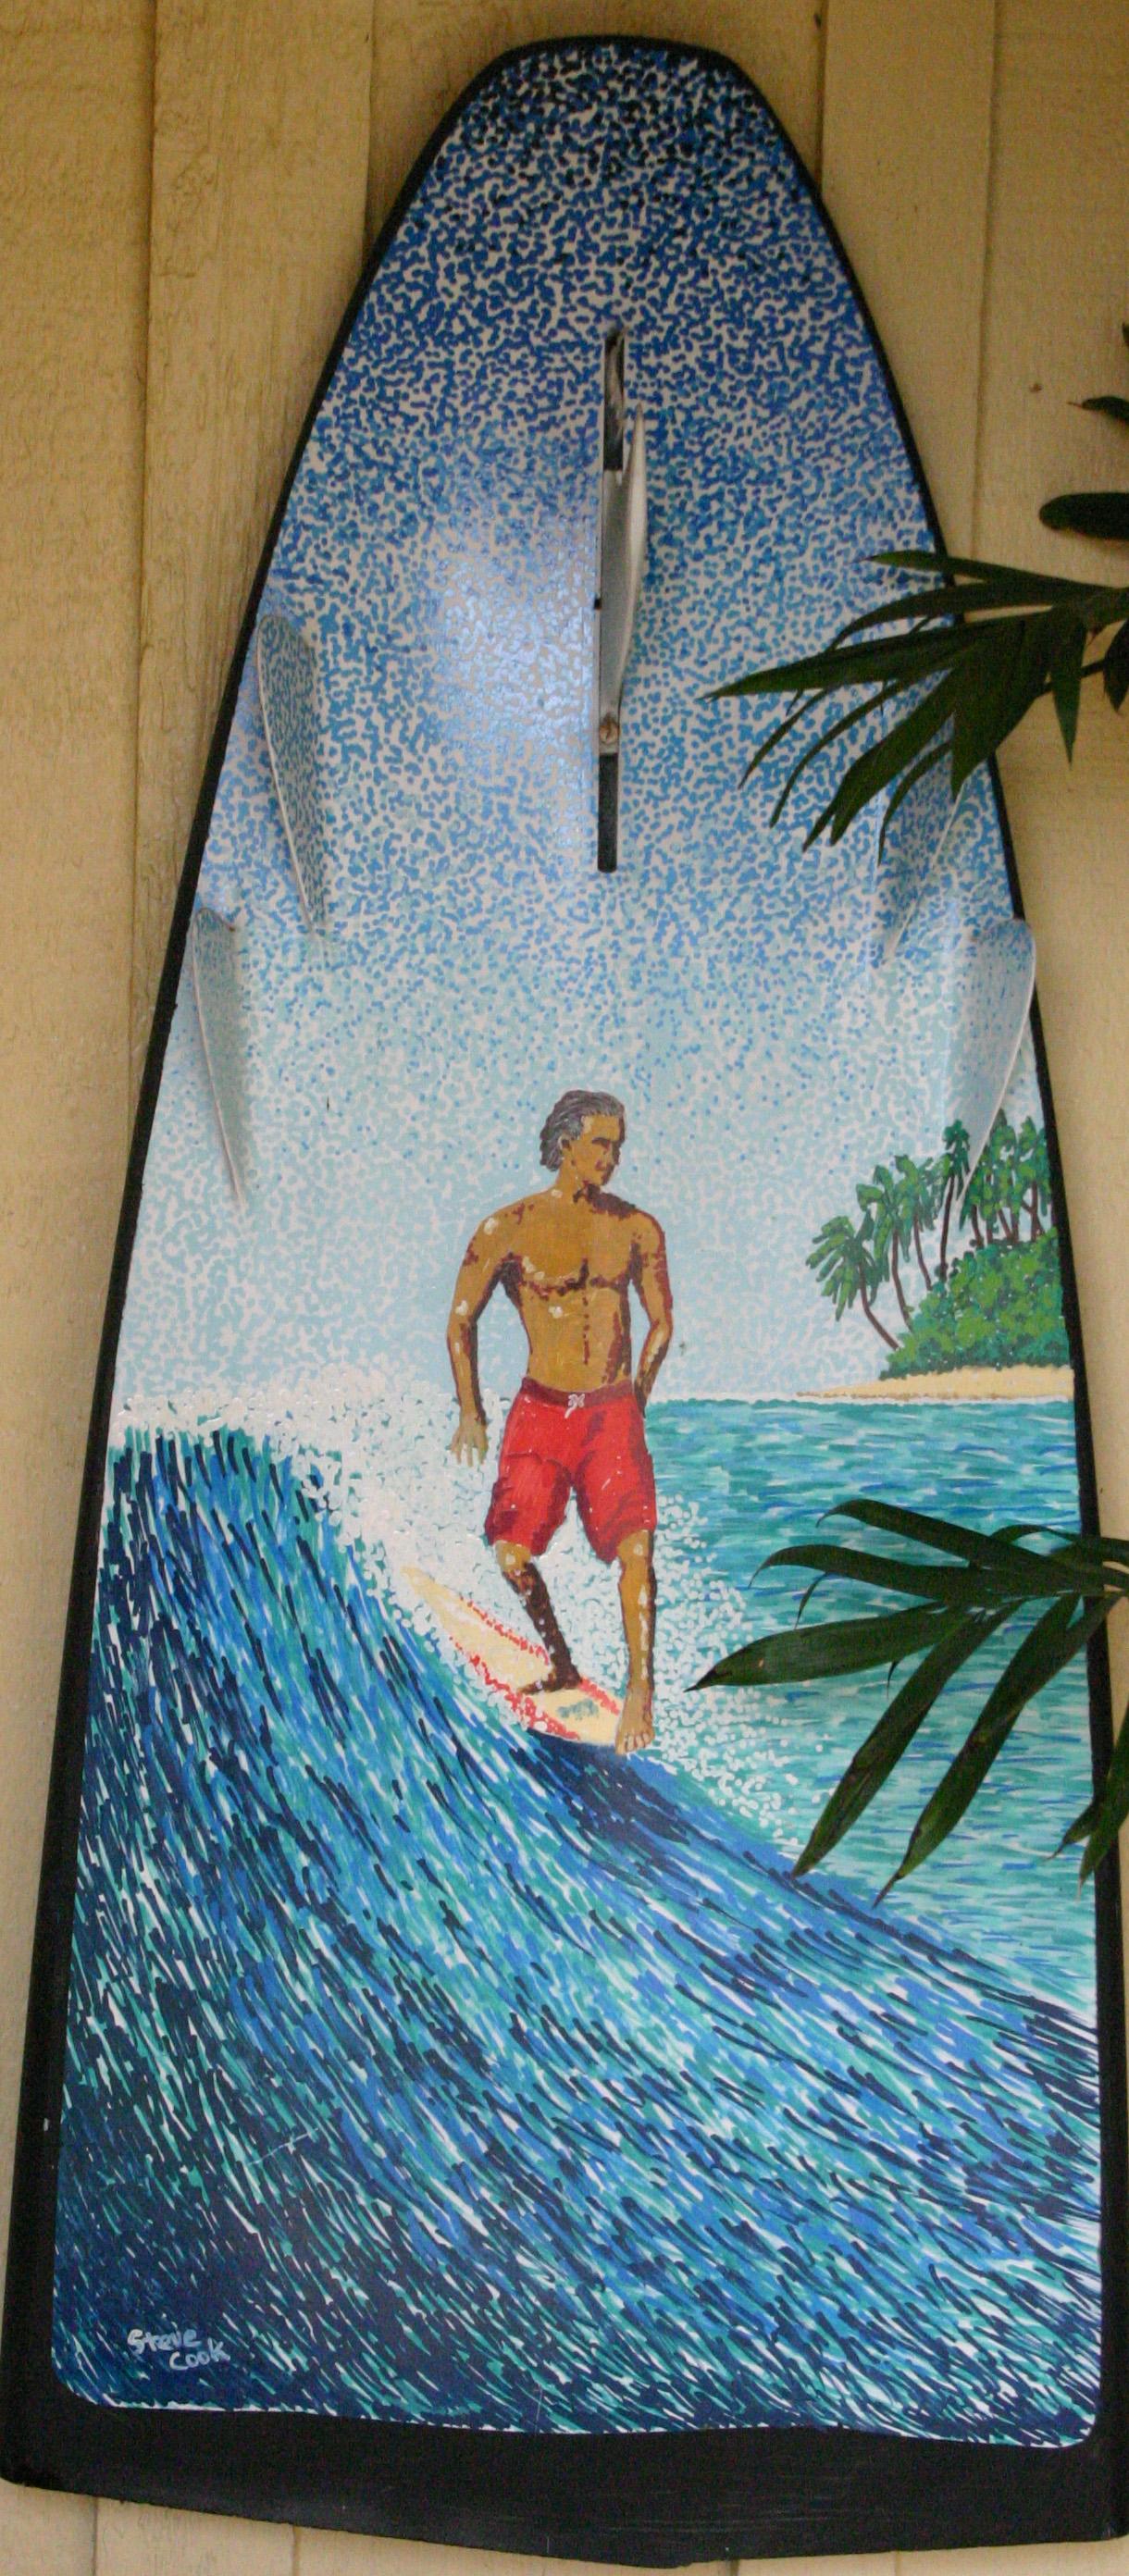 """Noserider on Broken Bonzer"" paint pens on surfboard   sold"